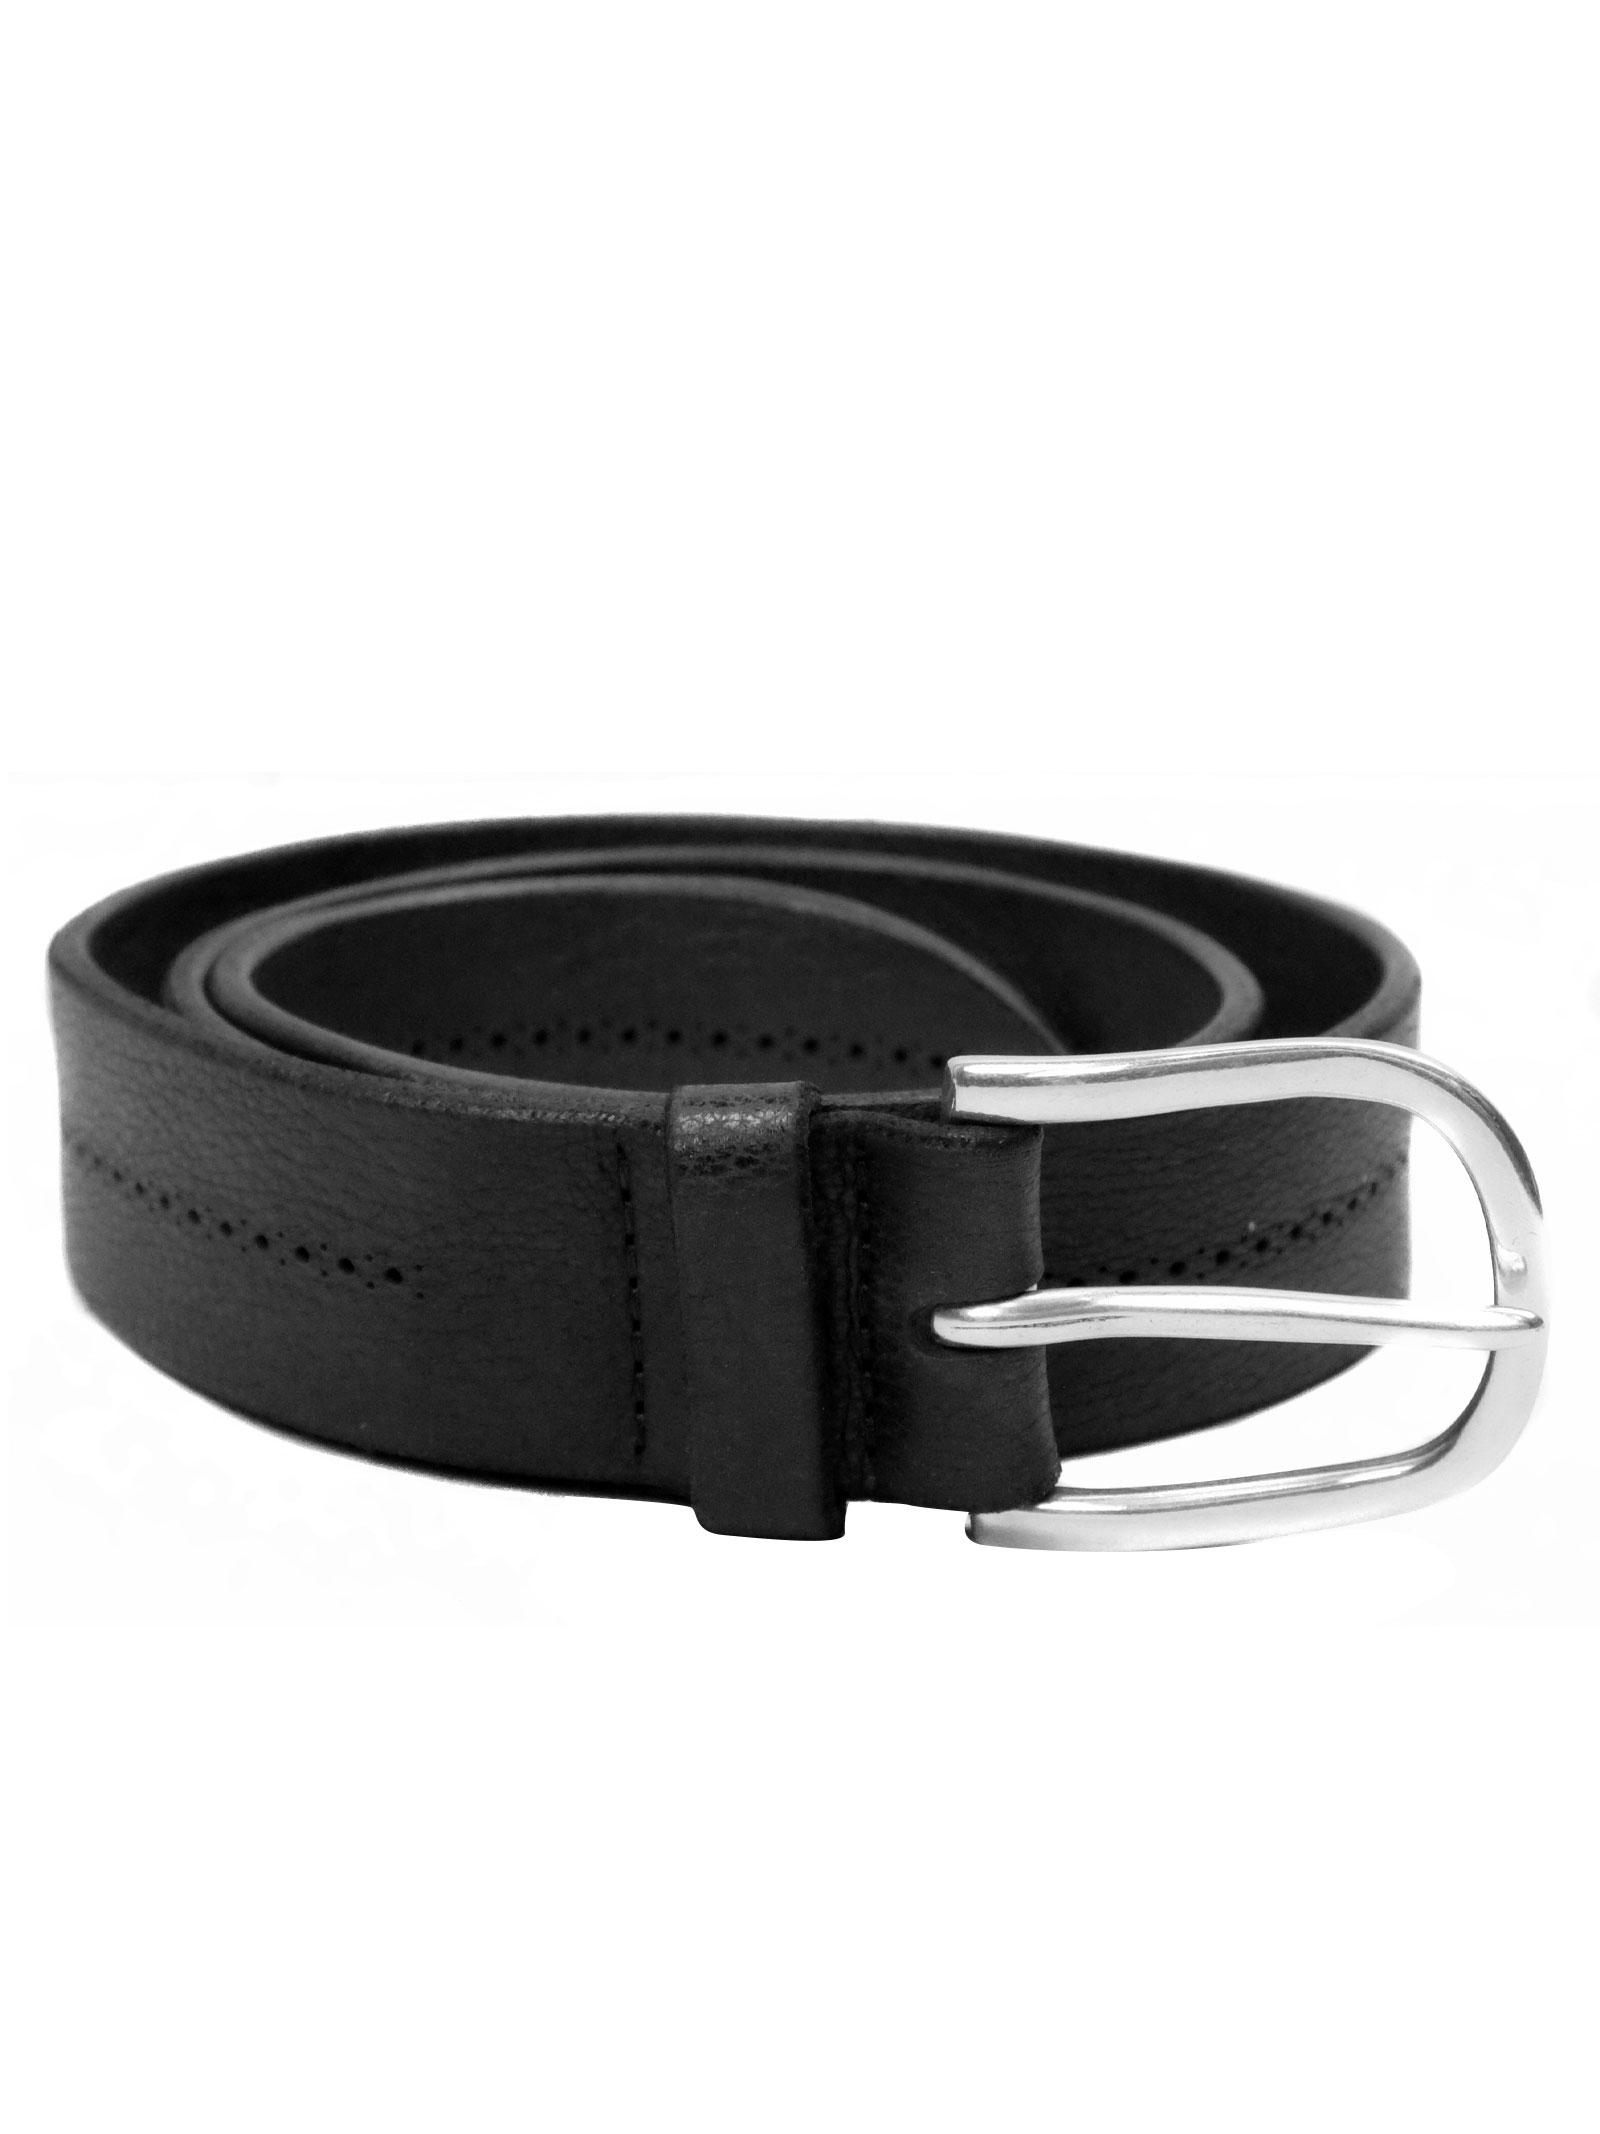 casual belt ORCIANI | Belts | 7942NERO